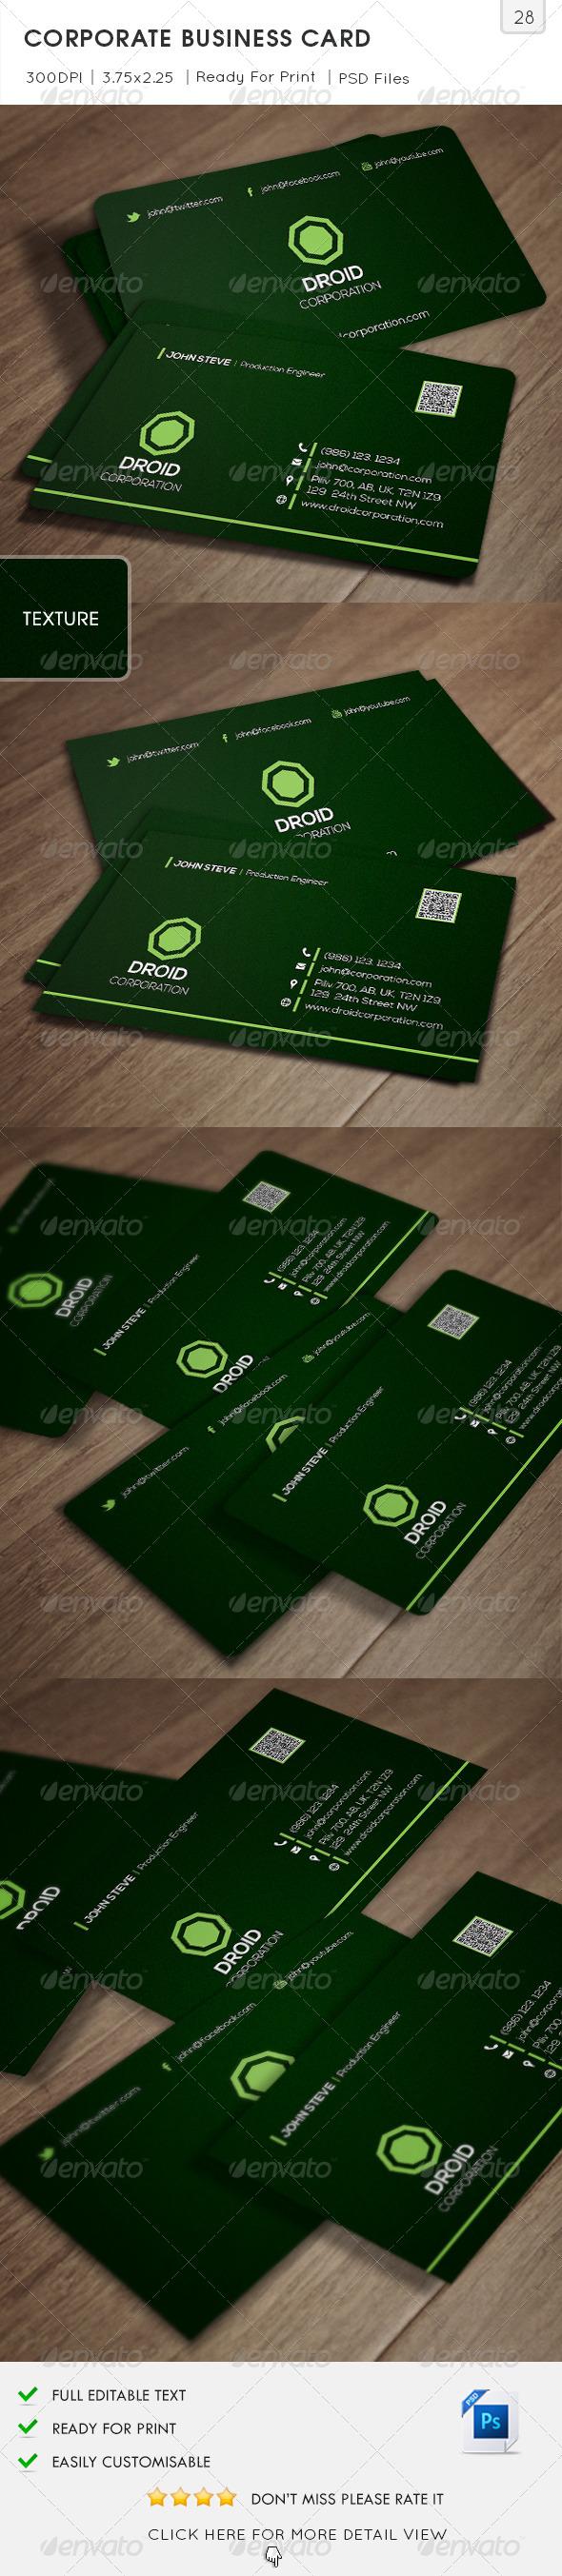 Corporate Business Card v28 - Corporate Business Cards